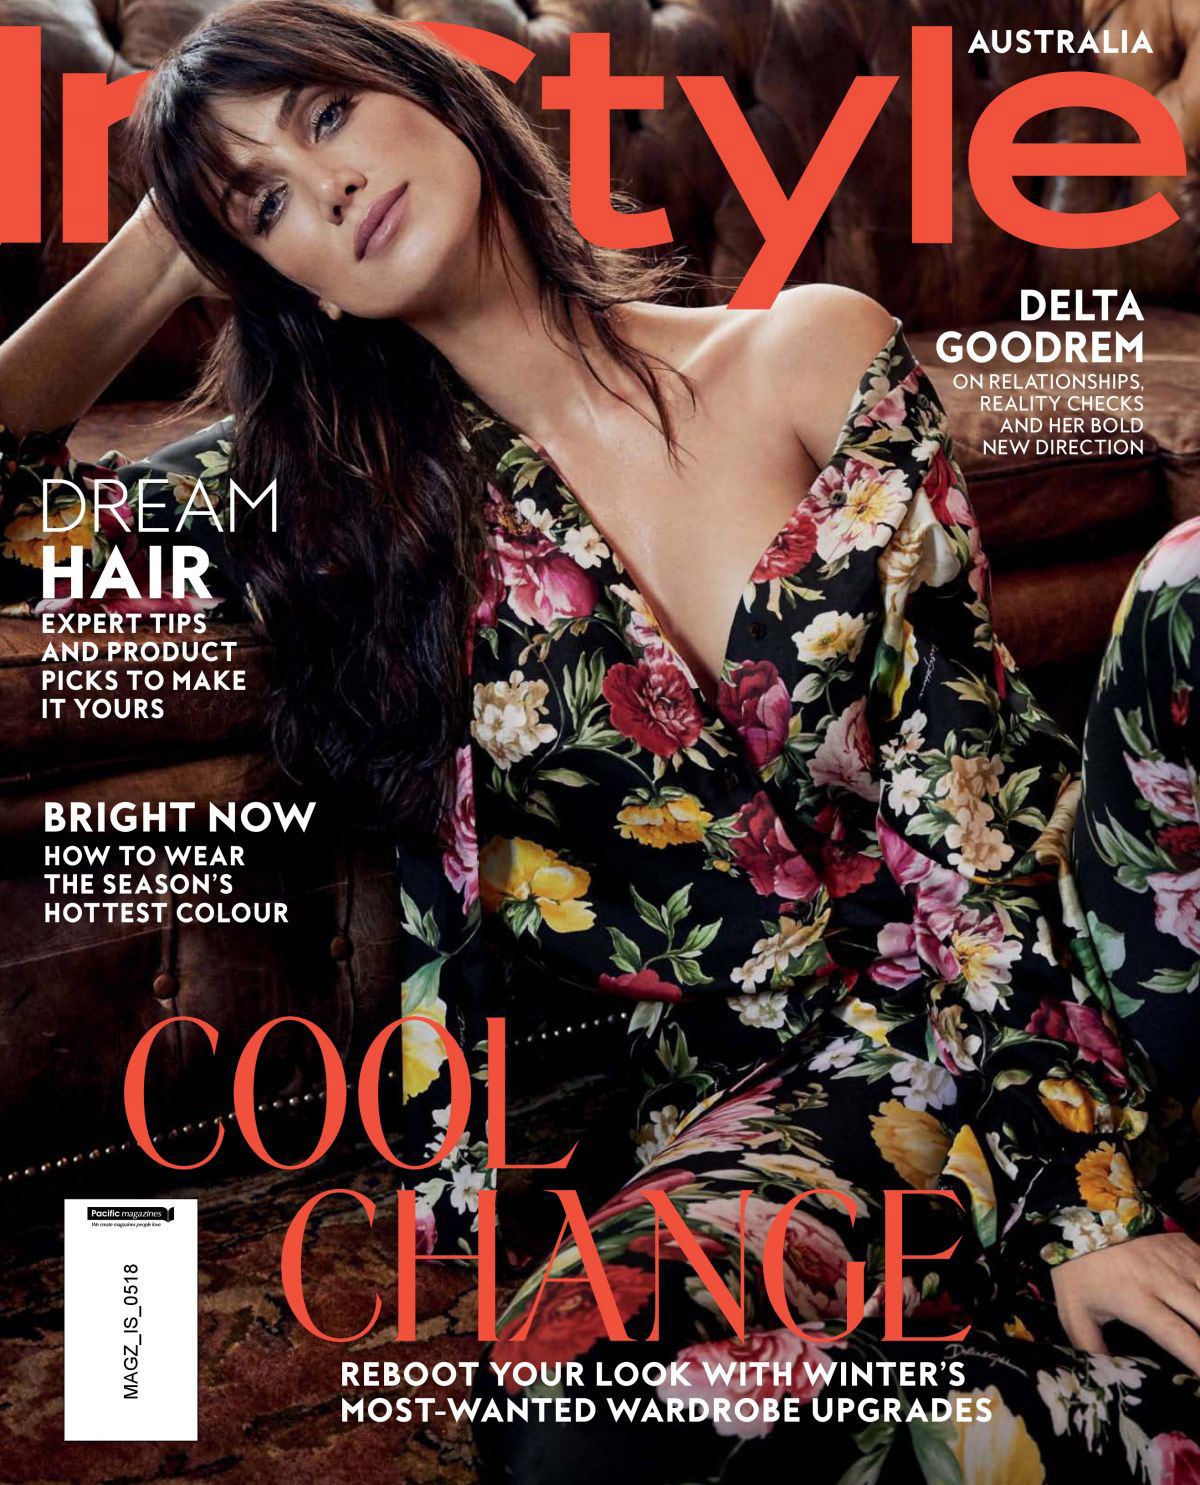 magazine covers delta goodrem instyle magazine australia may 2018 justfabzz. Black Bedroom Furniture Sets. Home Design Ideas